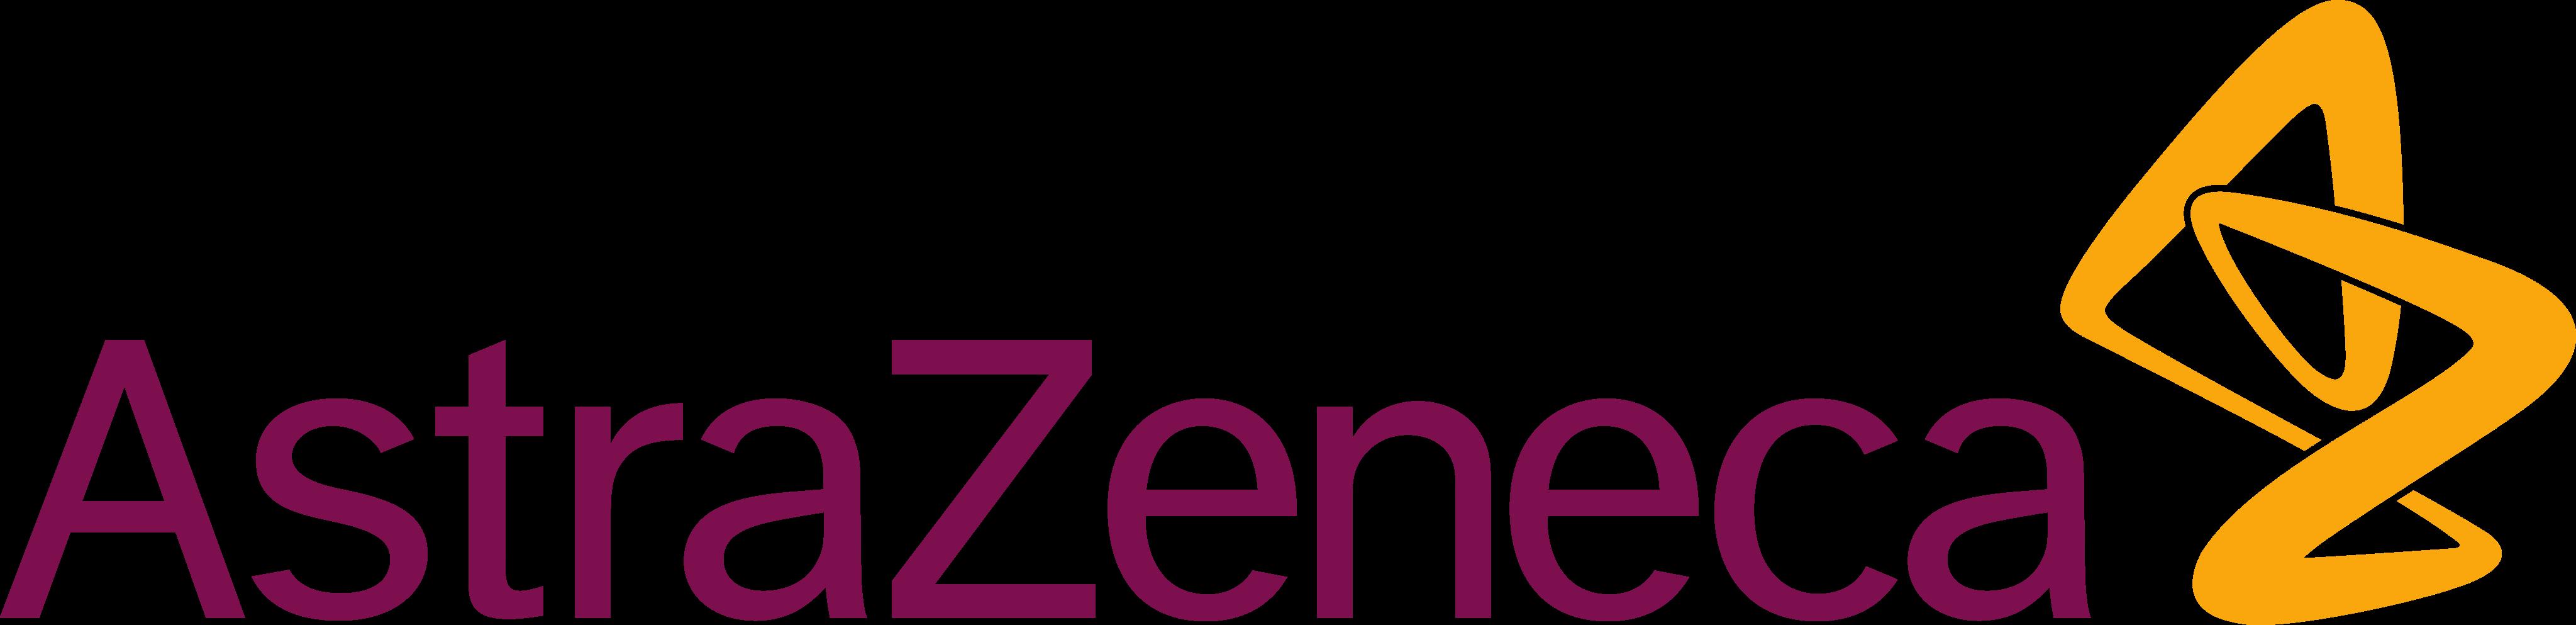 AstraZeneca Logo.